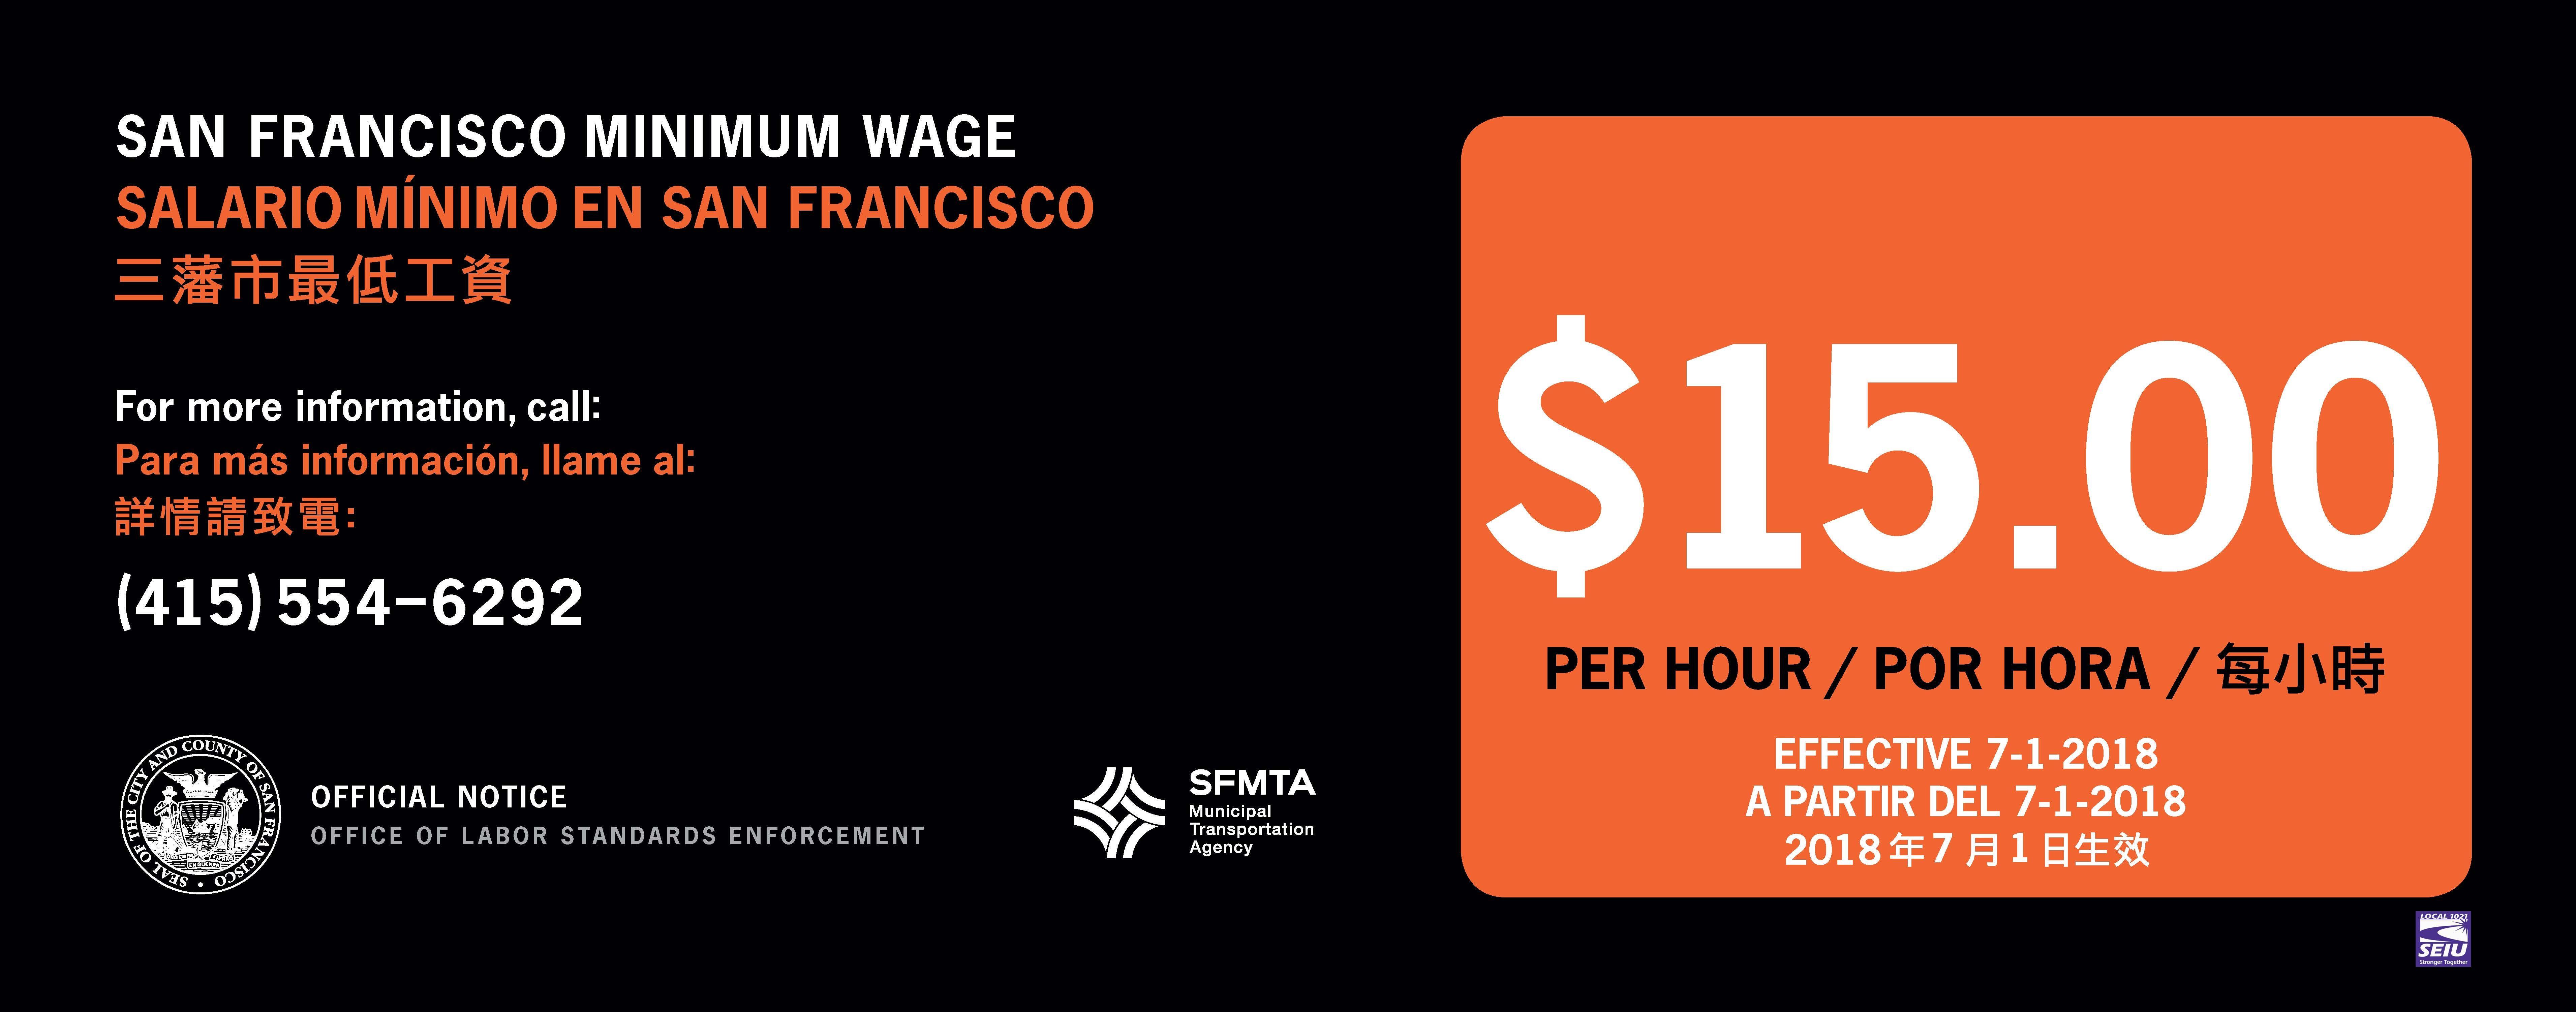 Minimum Wage Ordinance | Office of Labor Standards Enforcement